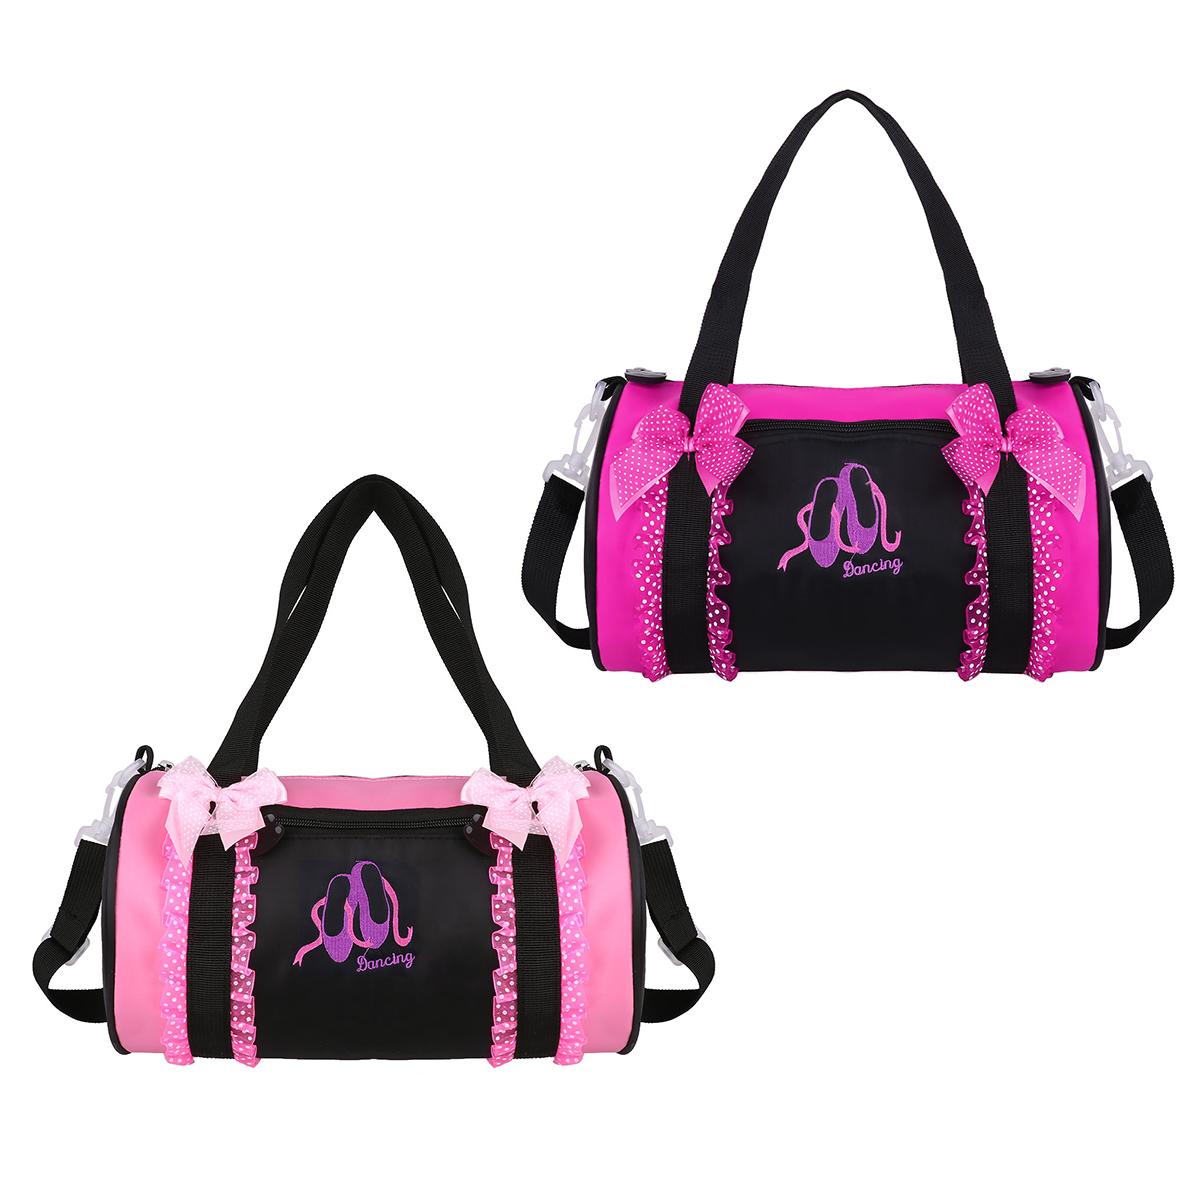 480b3b3c5a55 TiaoBug Kids Ballet Dance Bag Bowknot Ruffle Lace Embroidery Duffel Bag  Hand Bag Ballerina Party Dance Class Girls Shoulder Bag